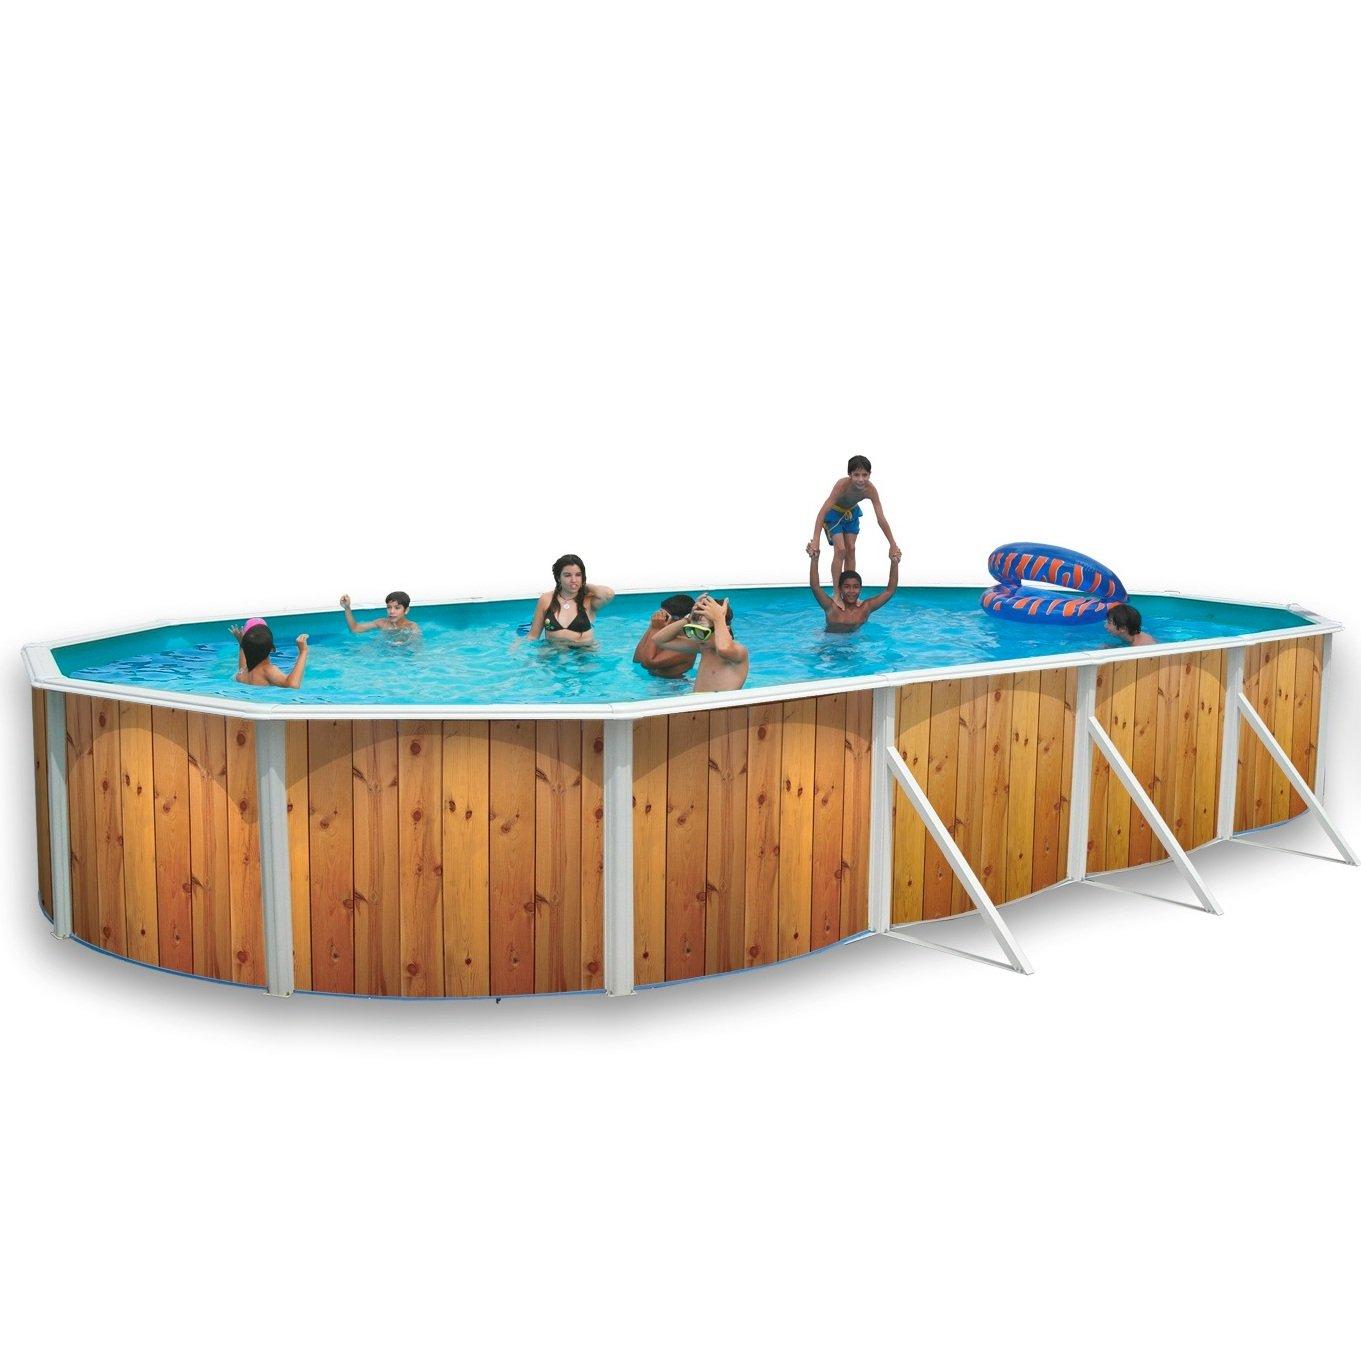 Weiß Coral Holz Effekt Oval Edelstahl Pool 9,15 m x 4,57 m: Amazon ...